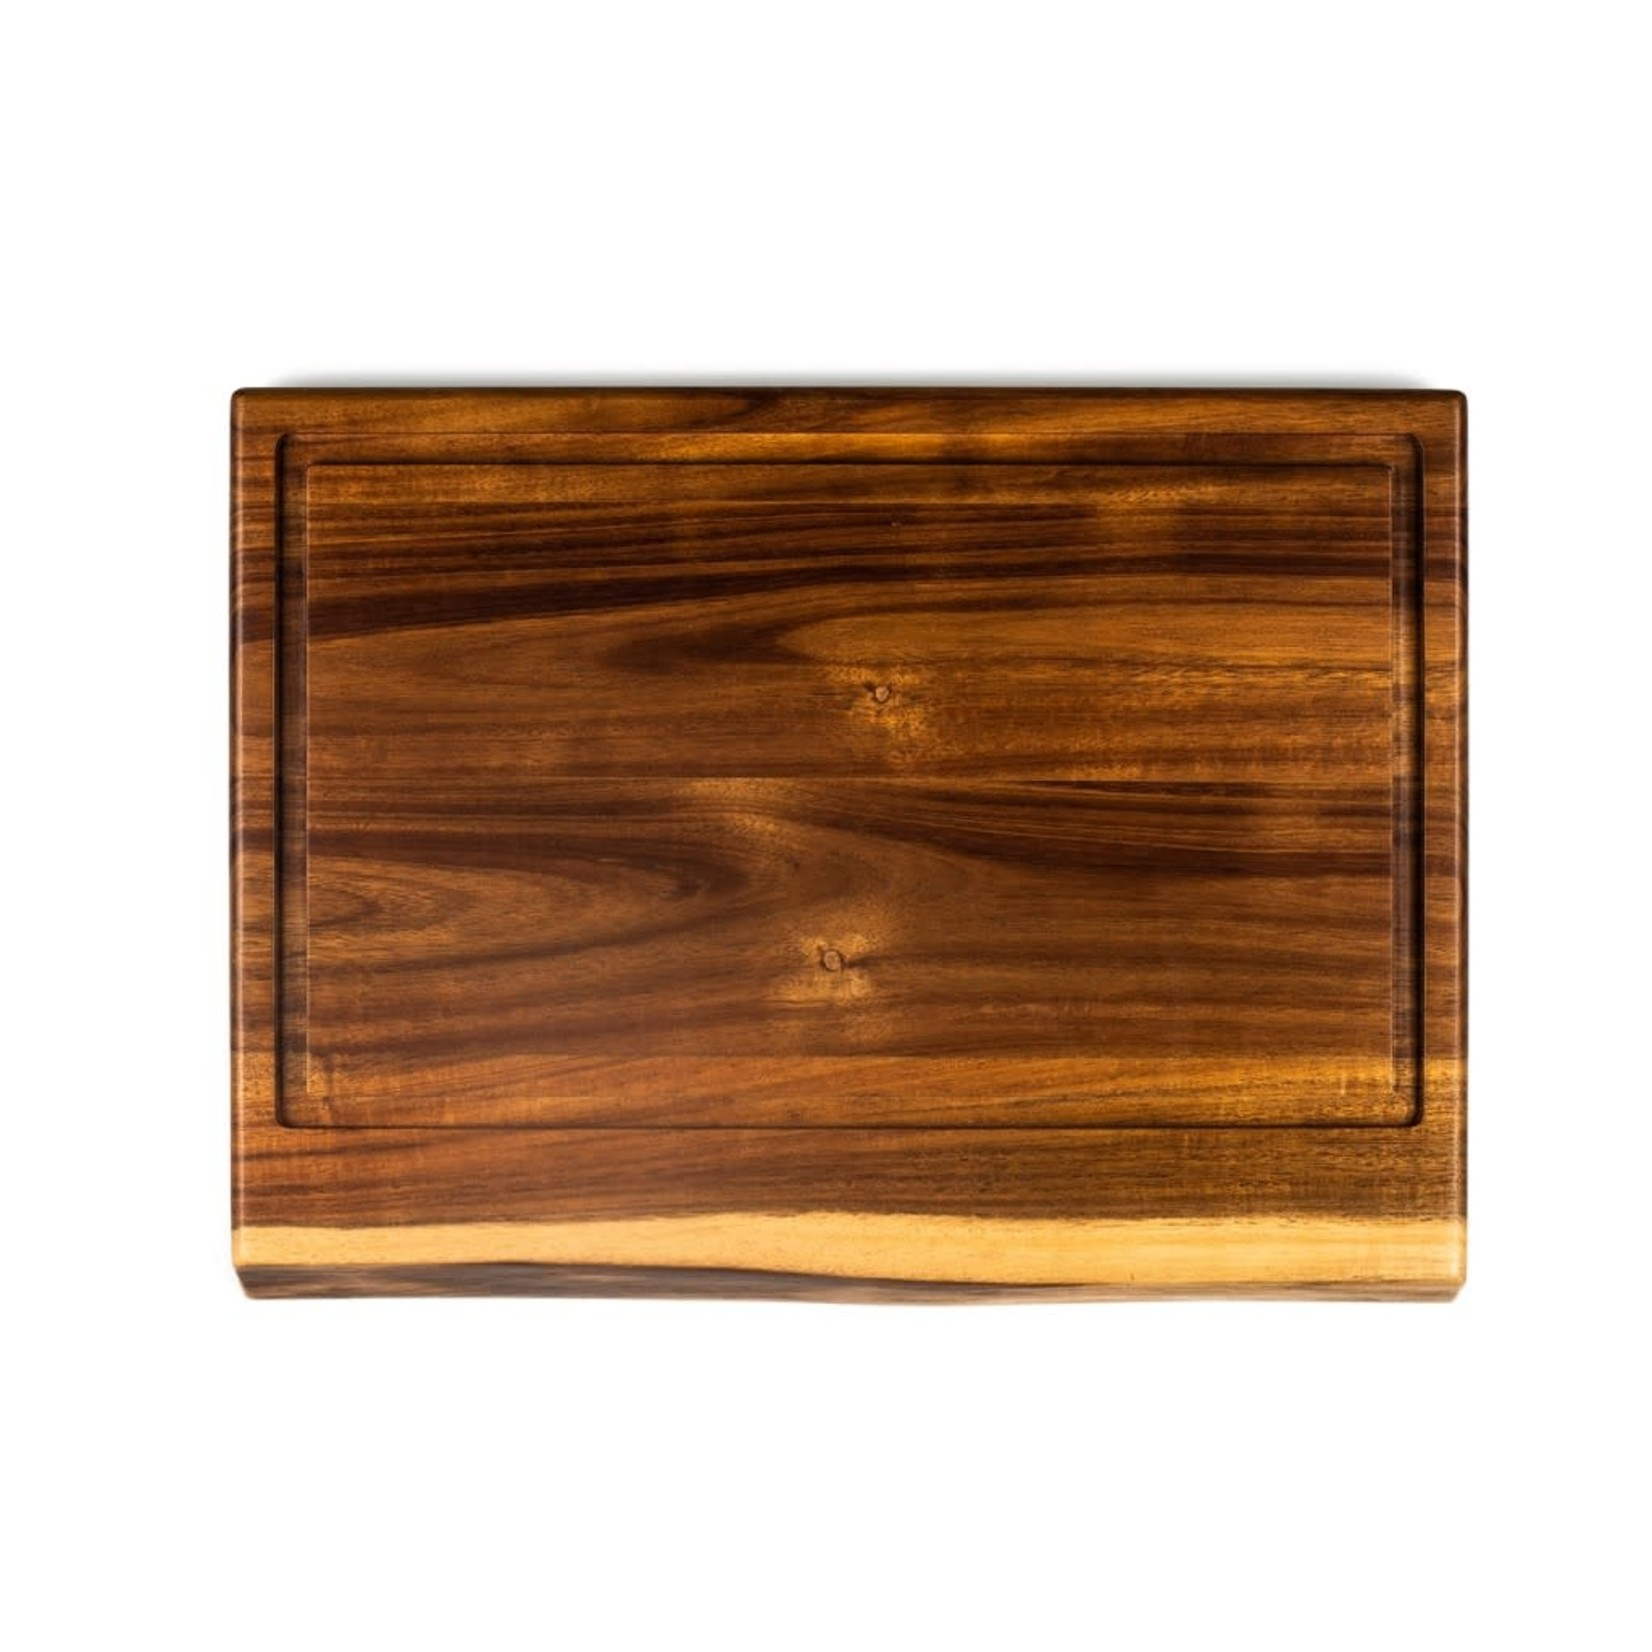 Snijplank Acacia 40x29x3cm /3/6